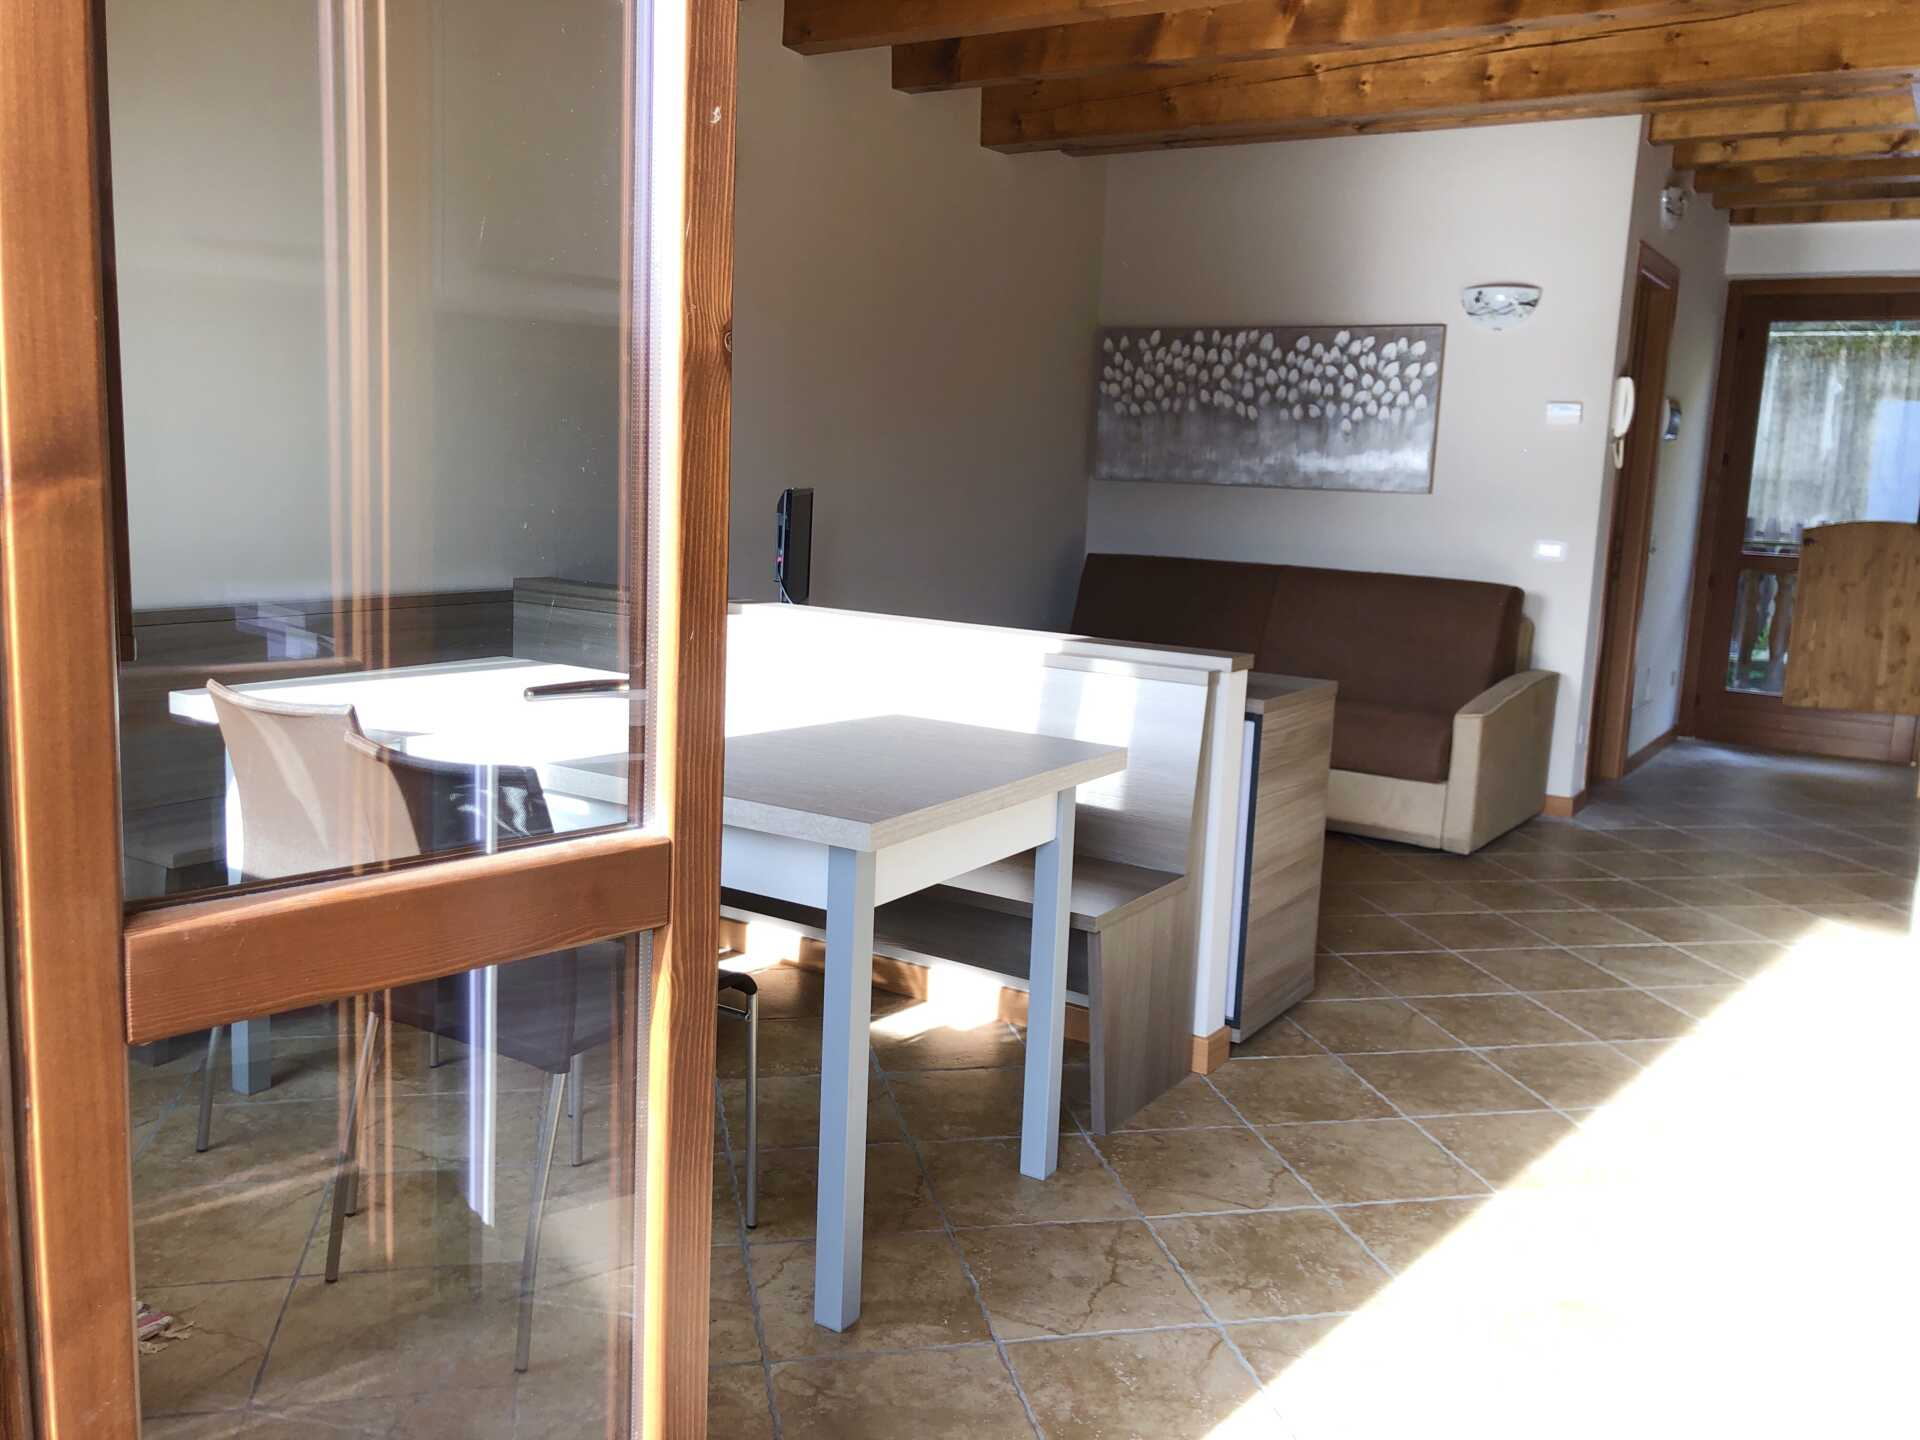 Casa-vacanze-in-vendita-appartamento-a-Dossena (3)